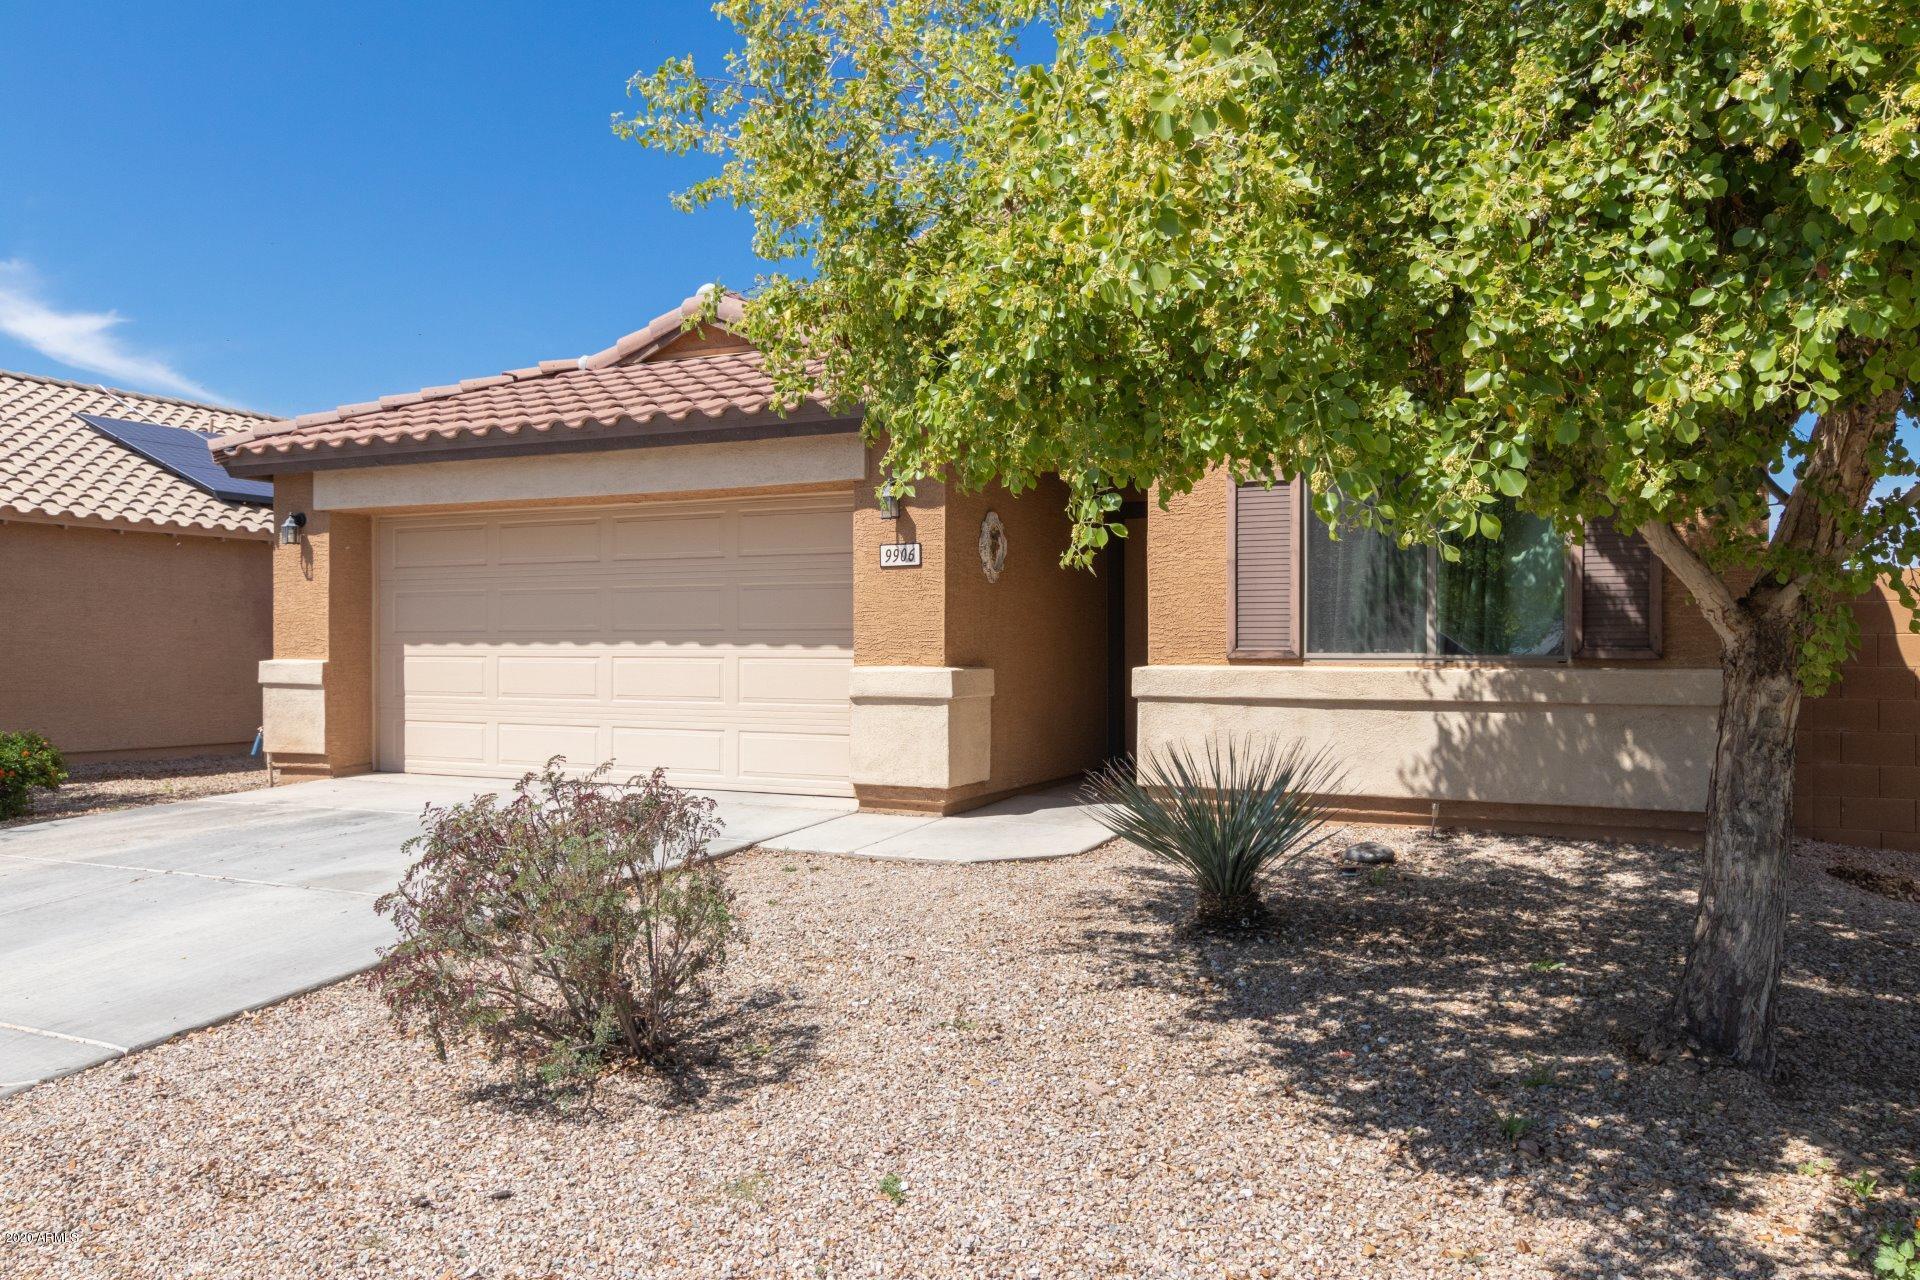 Photo of 9906 W HILTON Avenue, Tolleson, AZ 85353